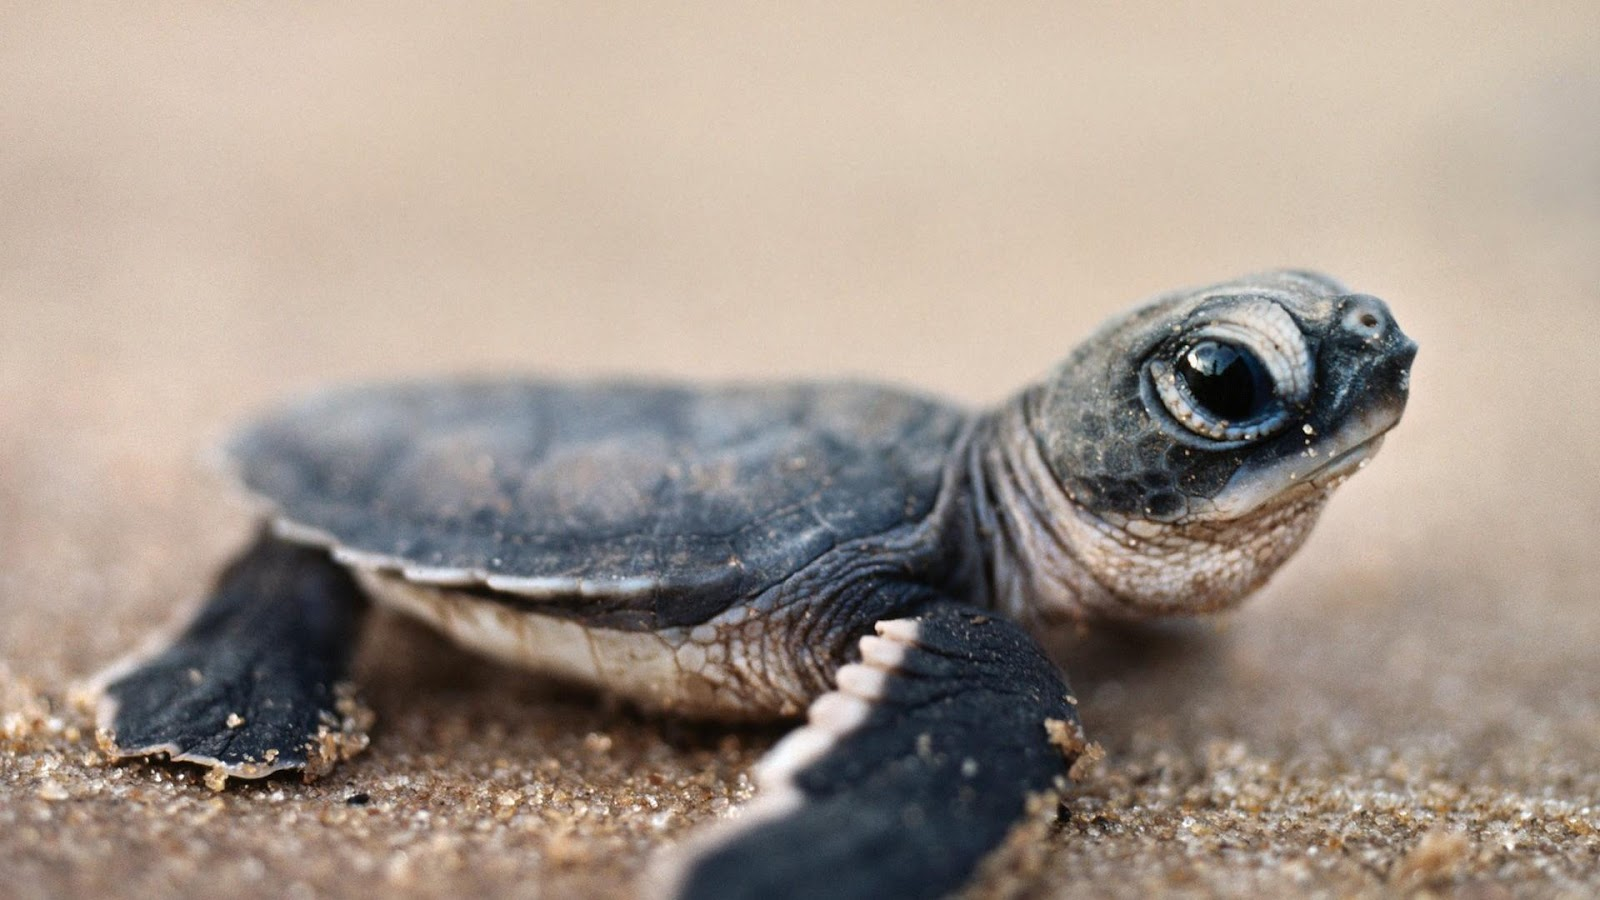 Animal facts: Turtles